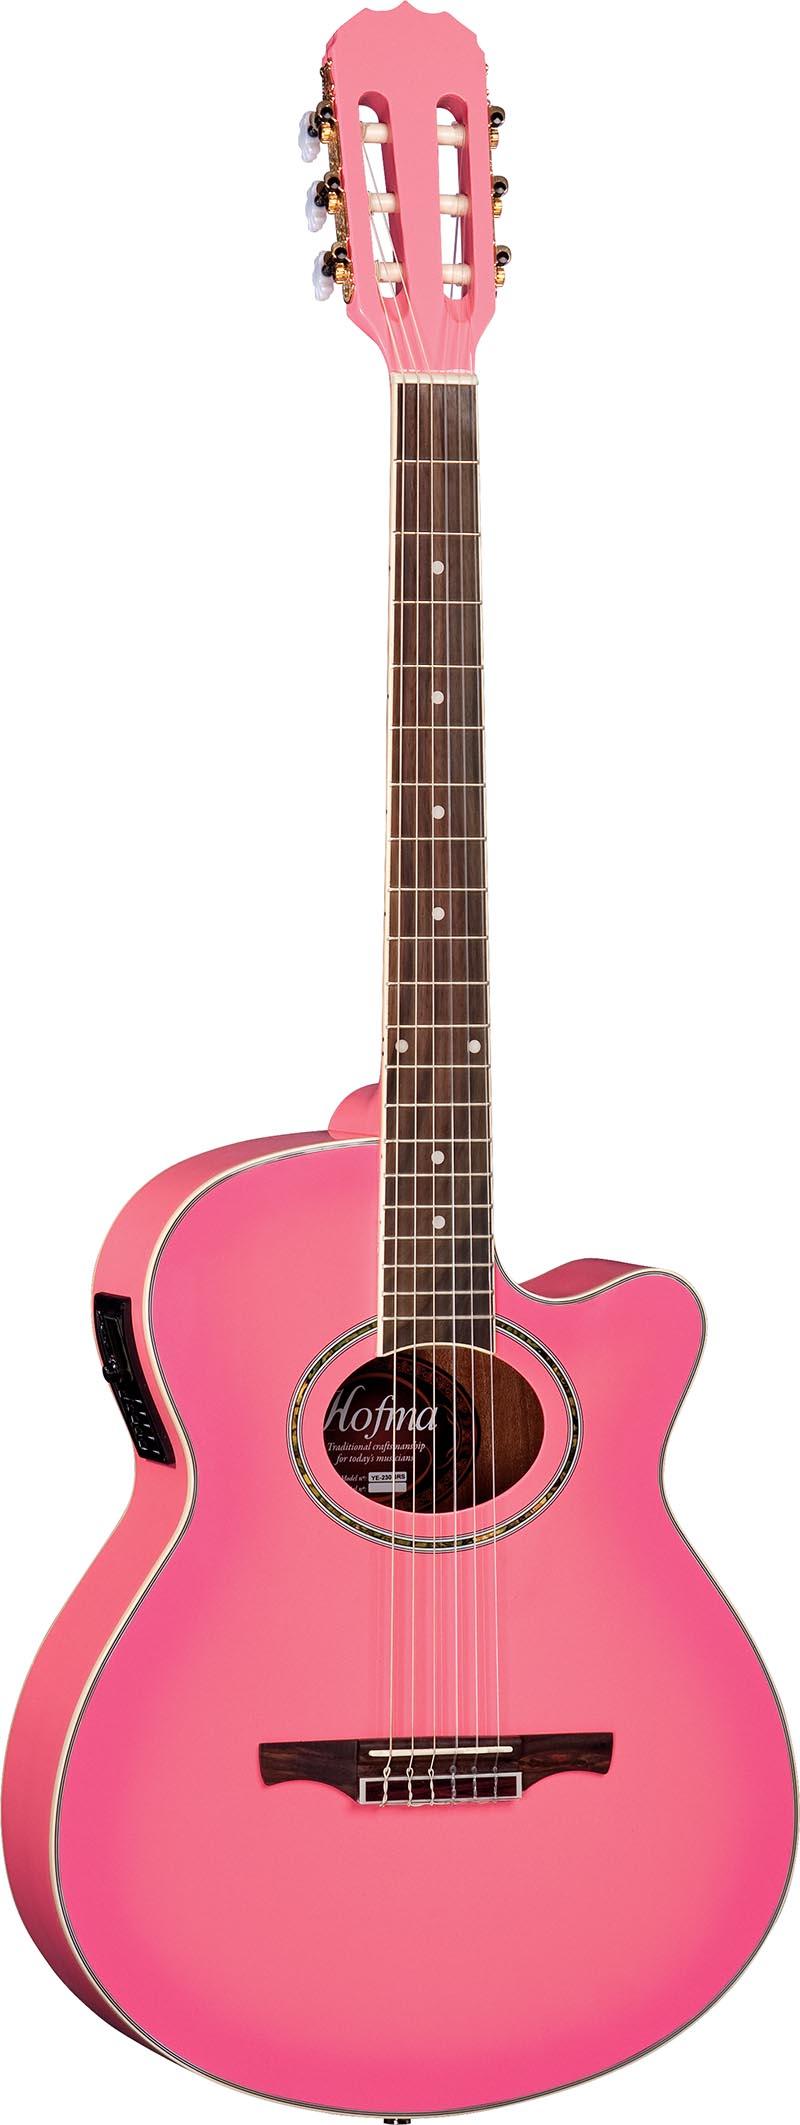 ye230 violao folk mini jumbo eletroacustico cordas de nailon ye230 srs rosa visao frontal vertical